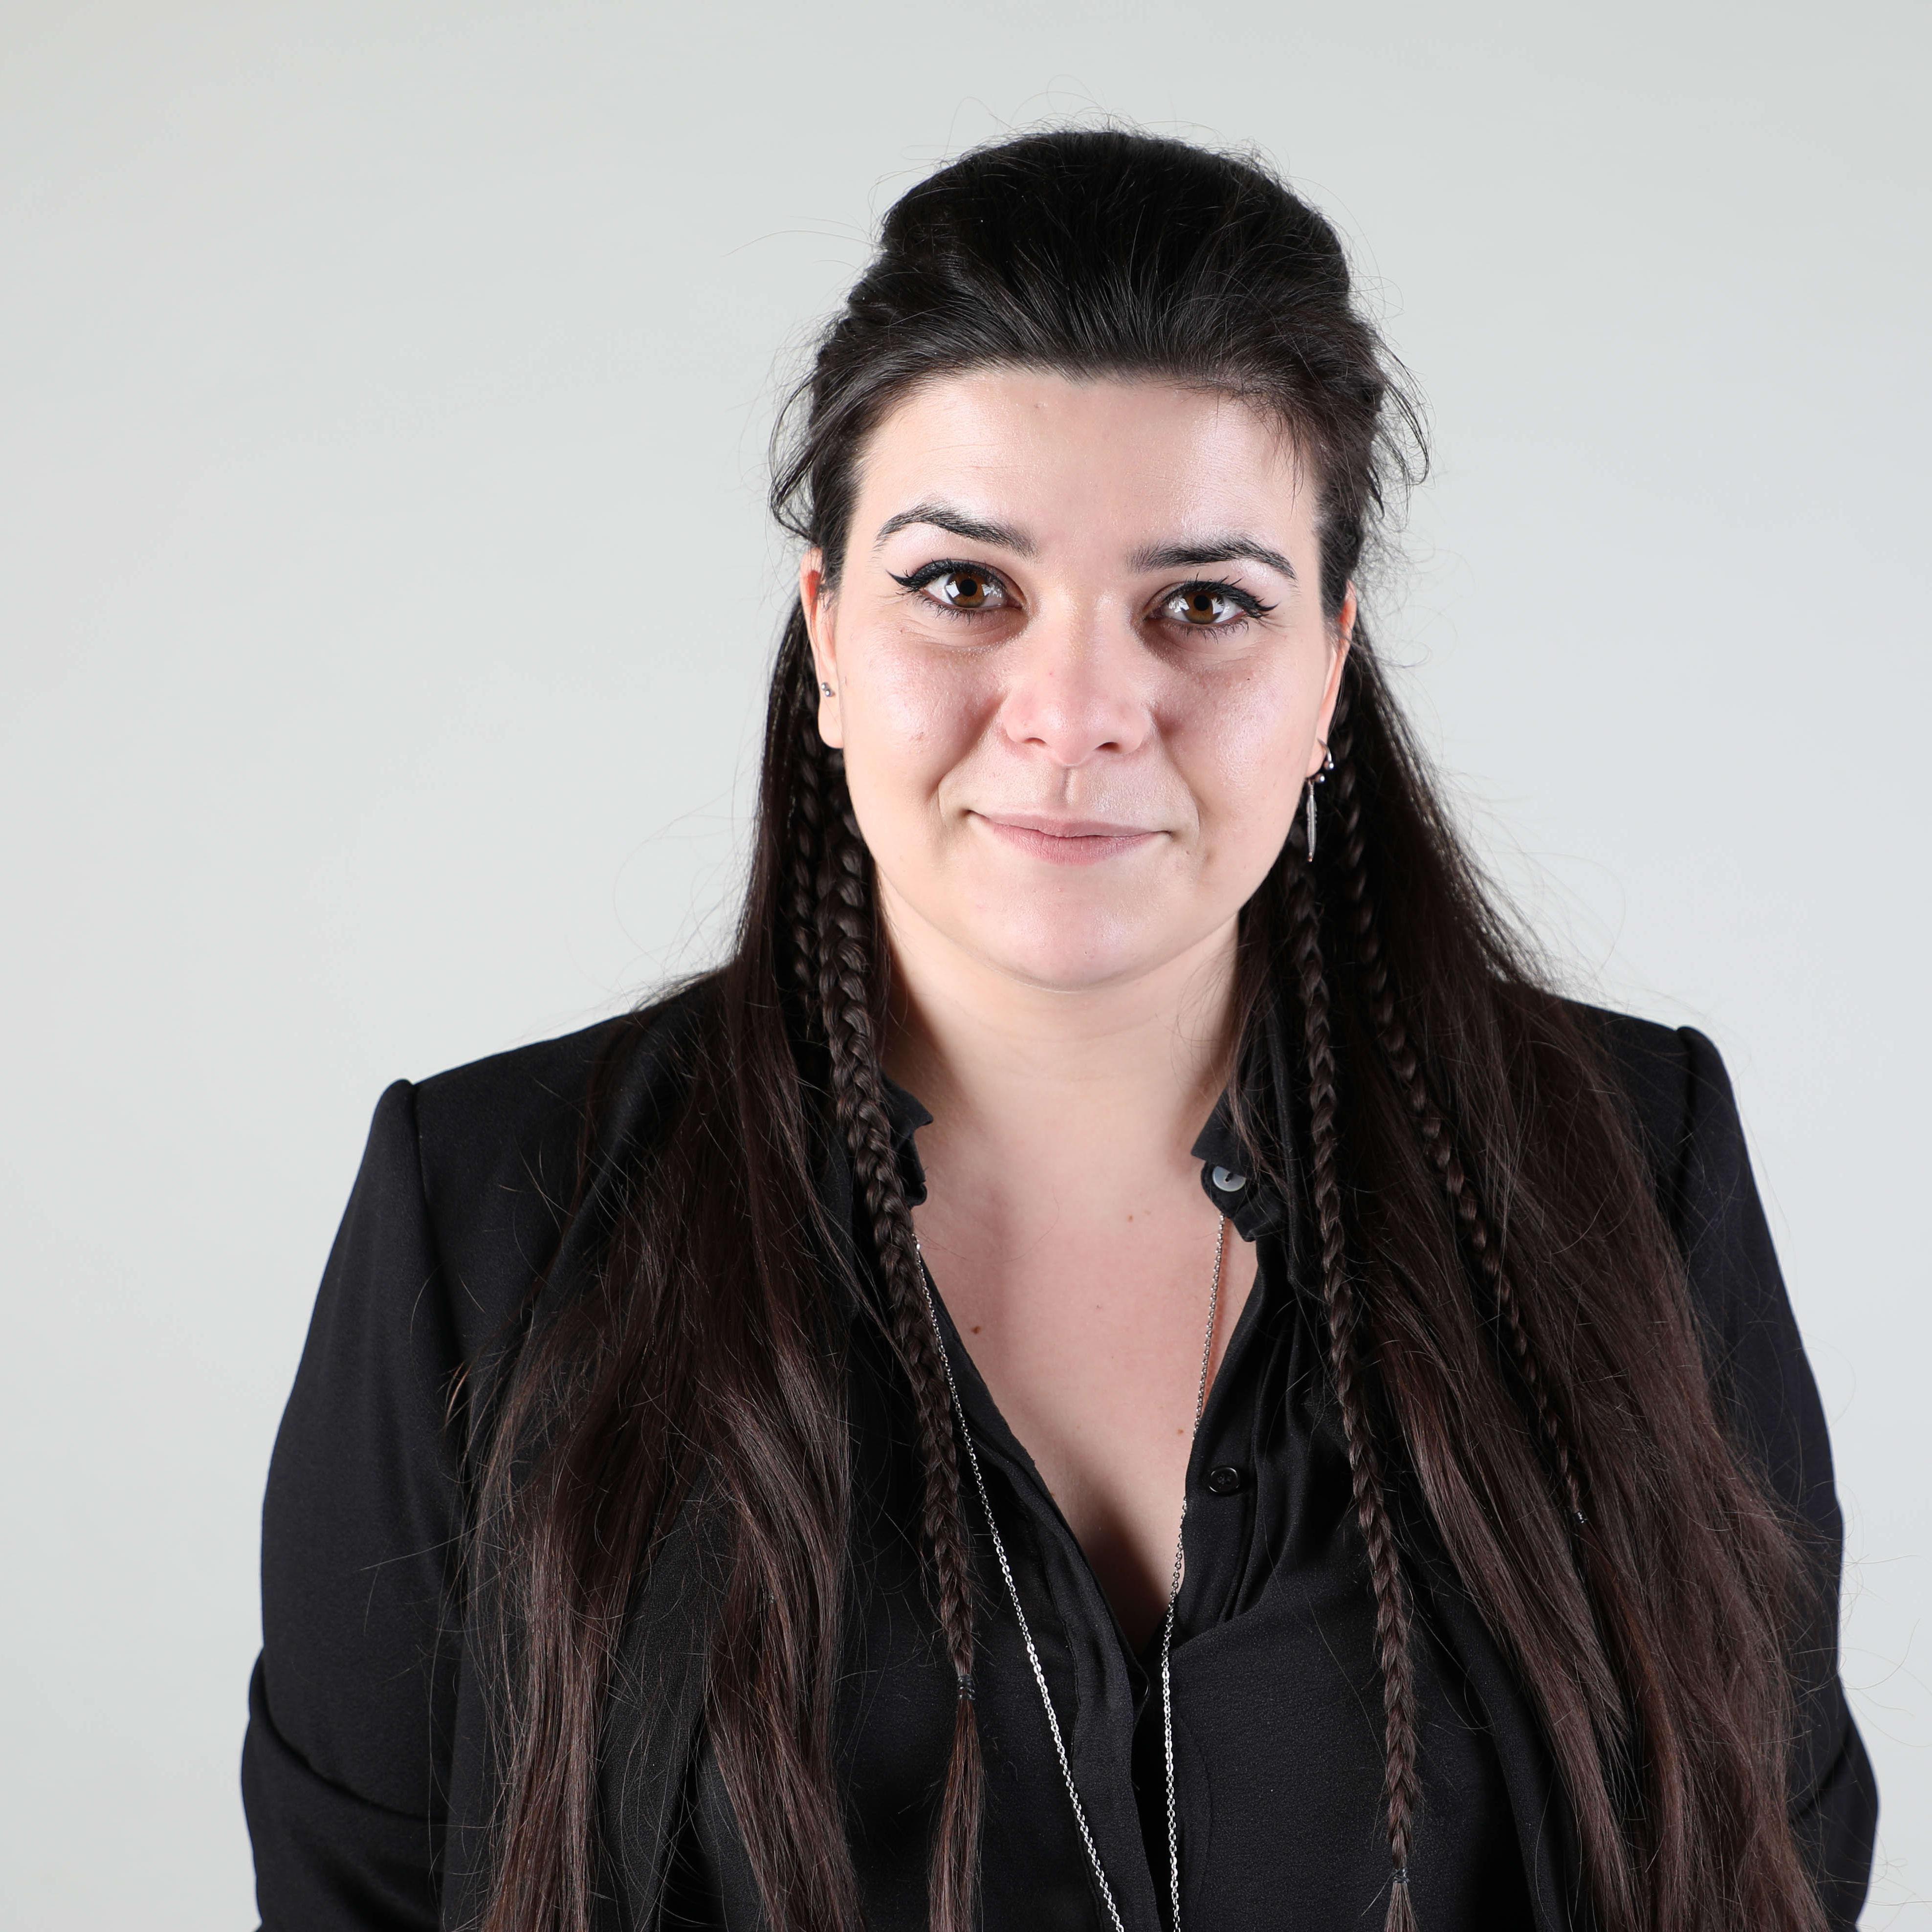 Profile photo of woman looking at camera